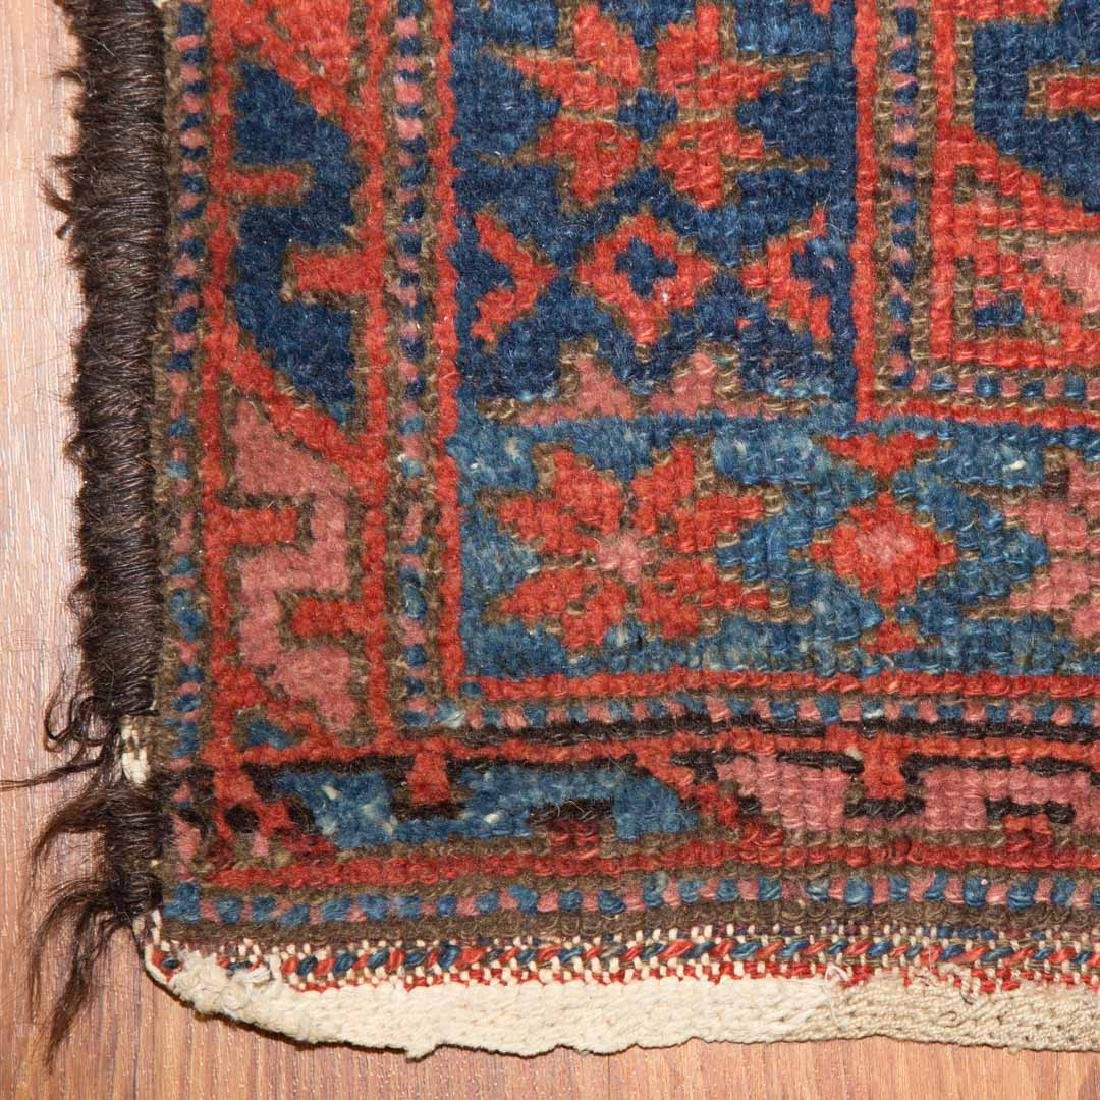 Antique Hamadan rug, approx. 3.10 x 6 - 2